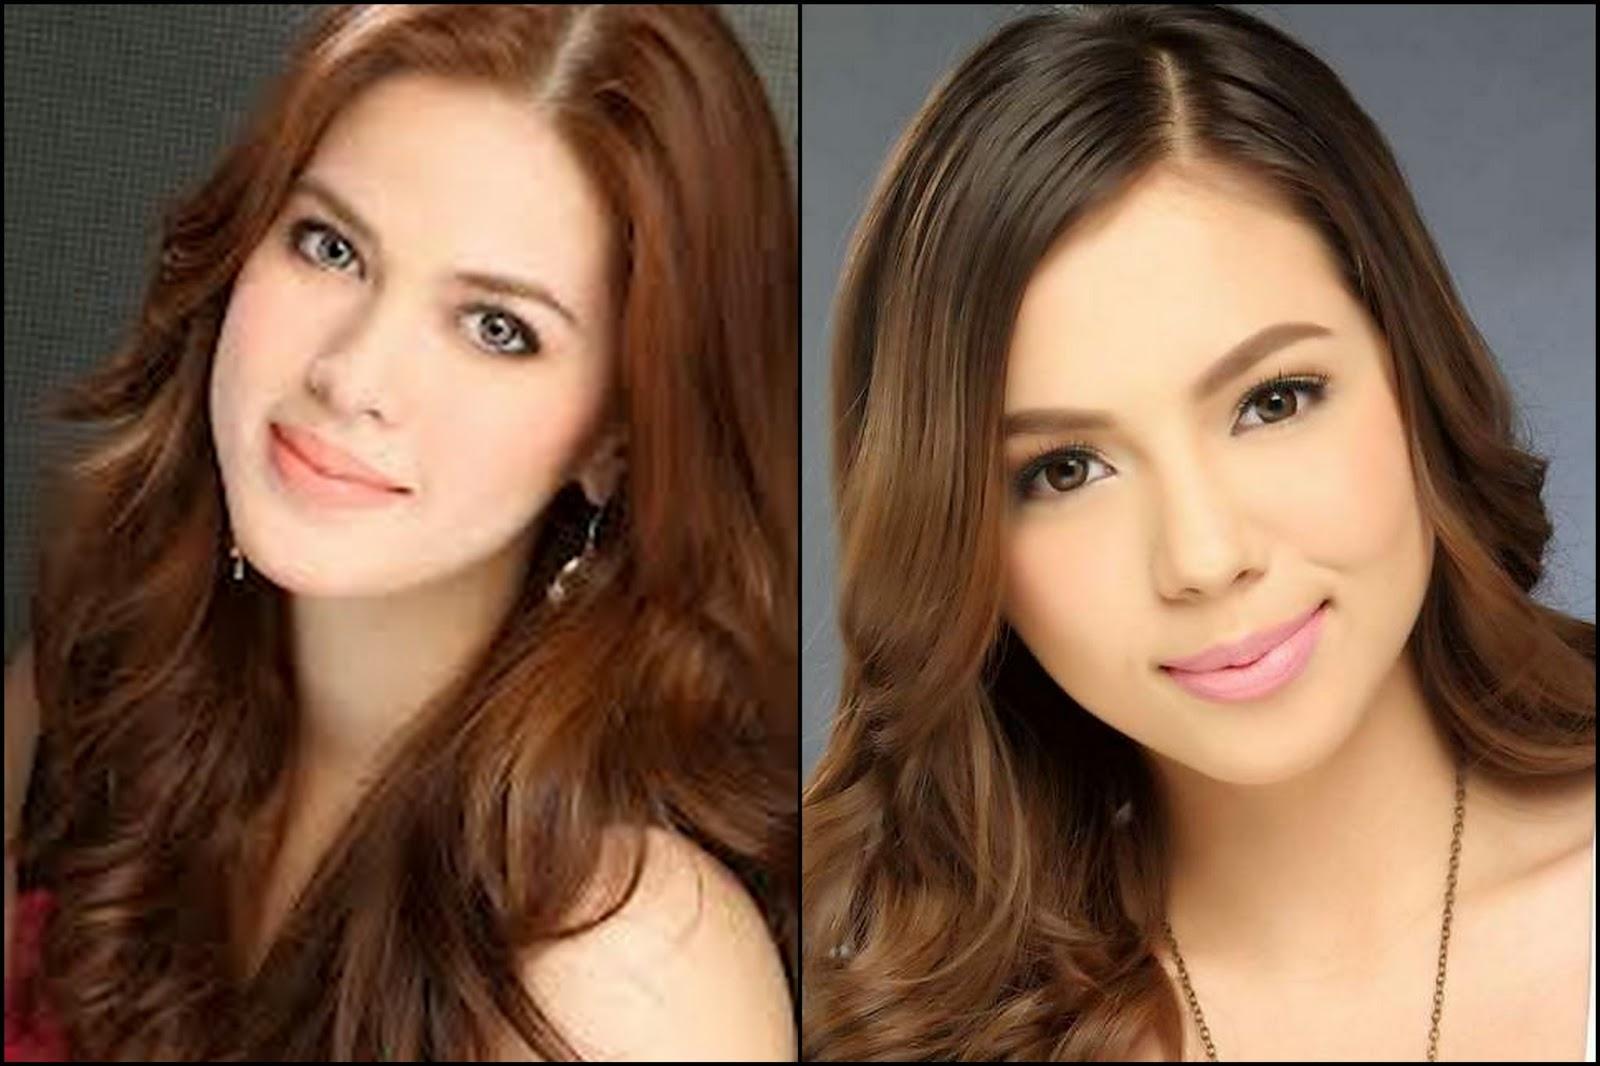 alike look Angelica panganiban